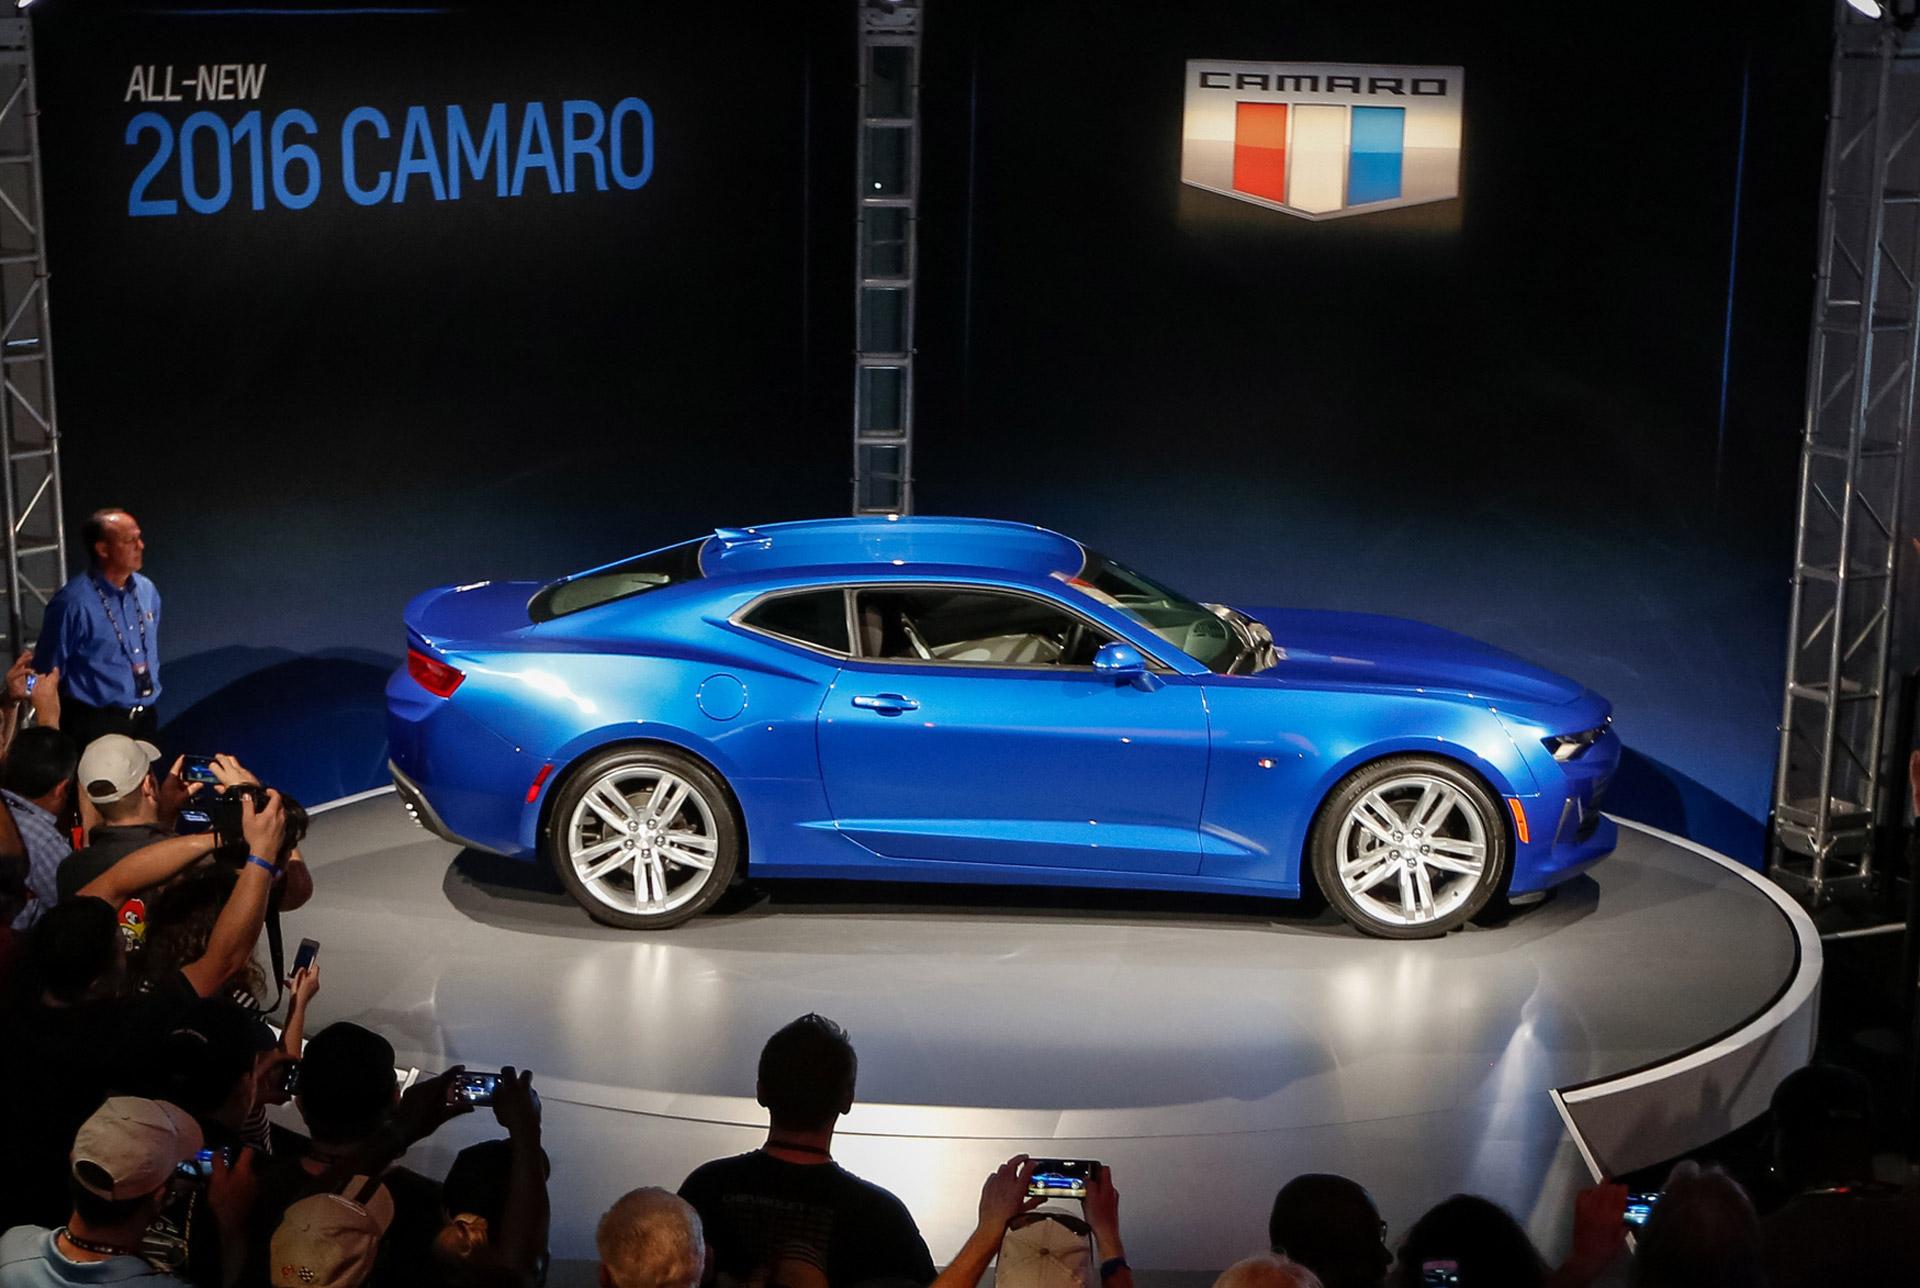 Jeremy Clarksons New Show Chevy Camaro Convertible Audi - Jeremy clarkson new car show